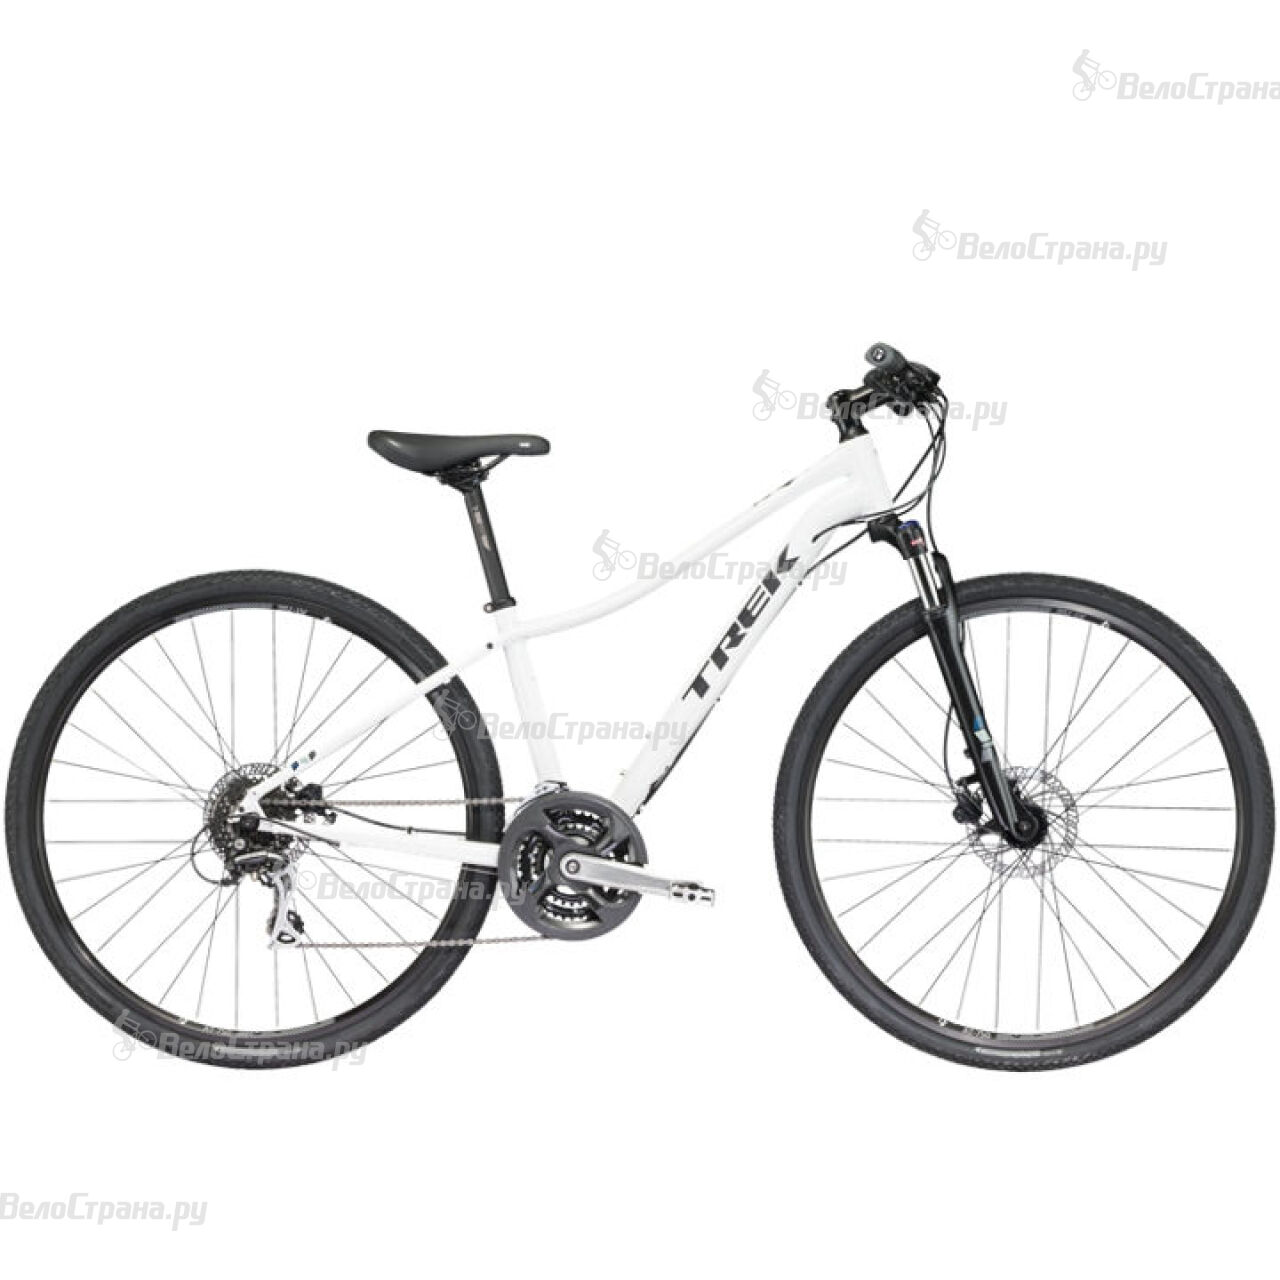 Велосипед Trek Neko 2 WSD (2017) велосипед trek neko 1 wsd 2018